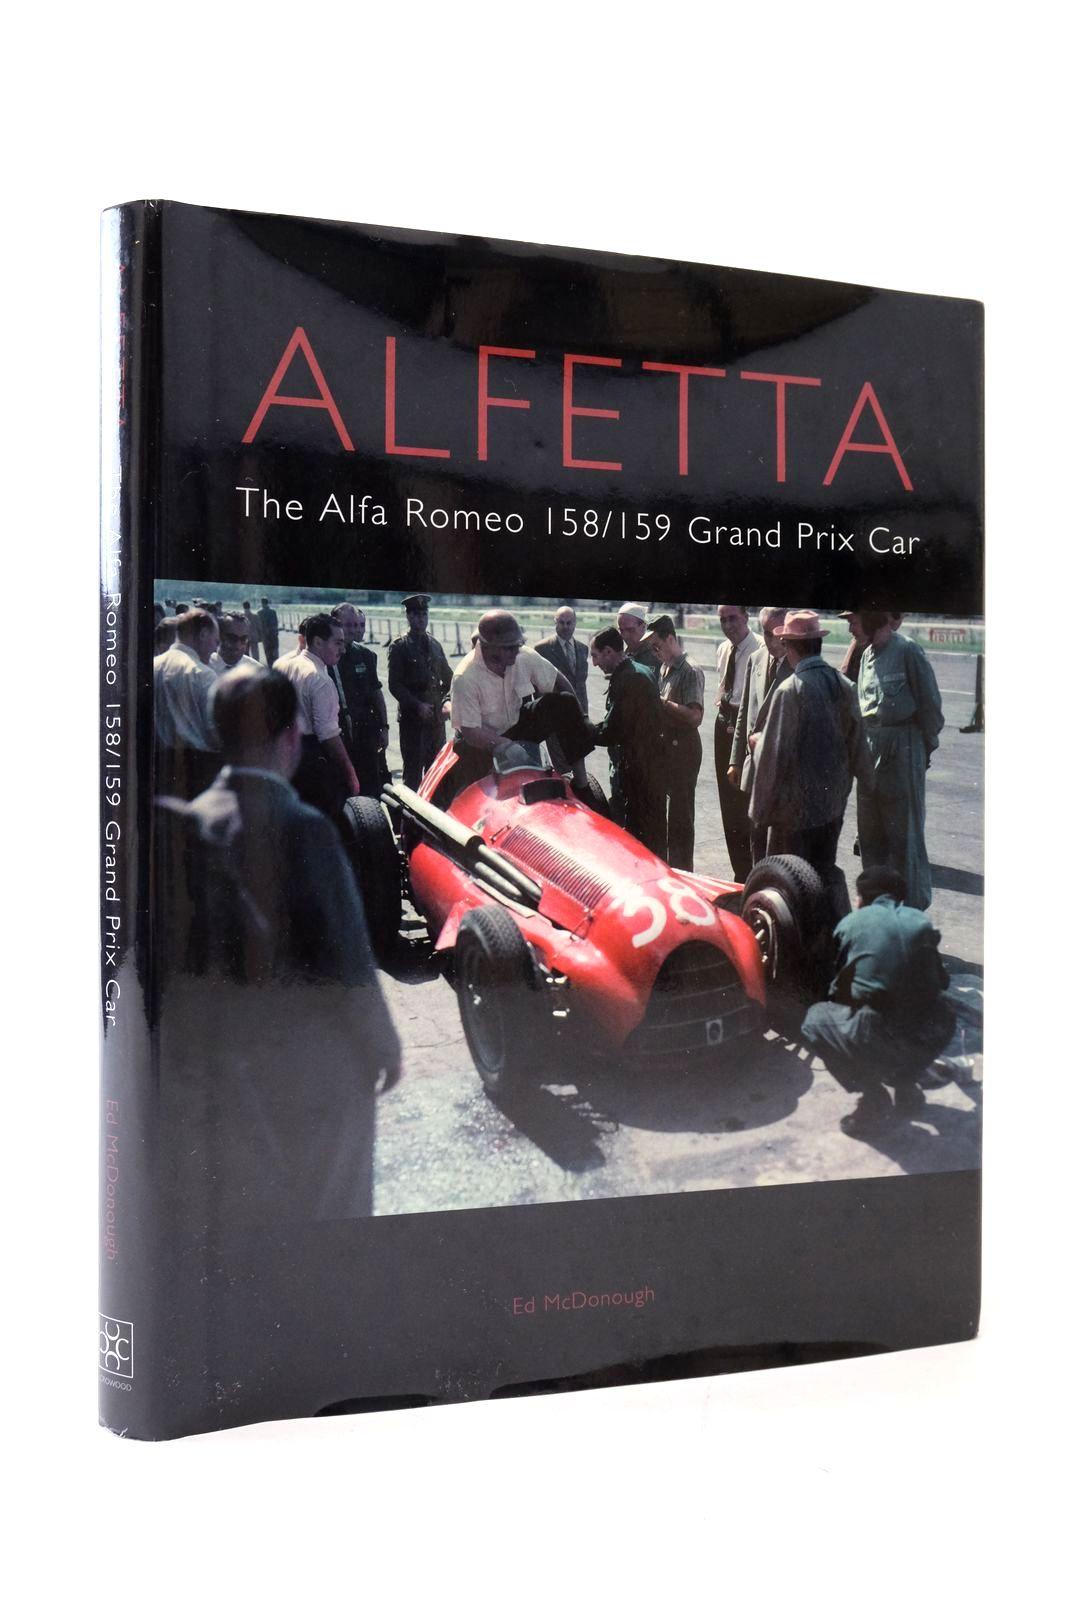 Photo of ALFETTA: THE ALFA ROMEO 158/159 GRAND PRIX CAR- Stock Number: 2135128